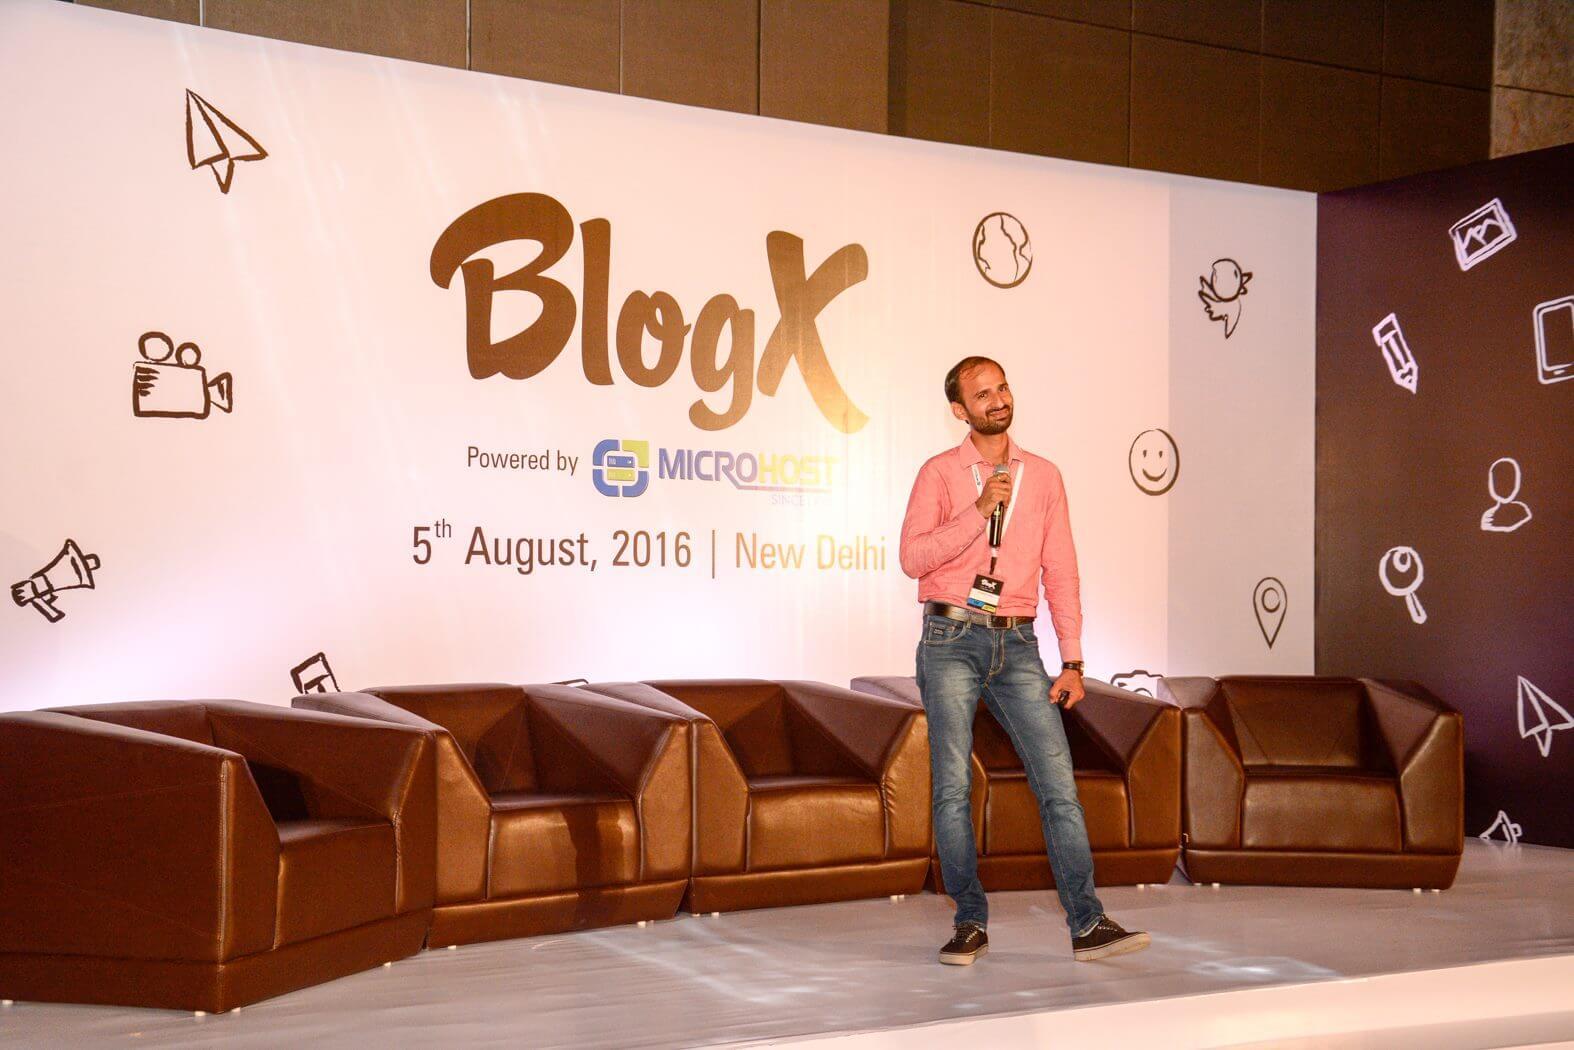 kulwant nagi at blogx